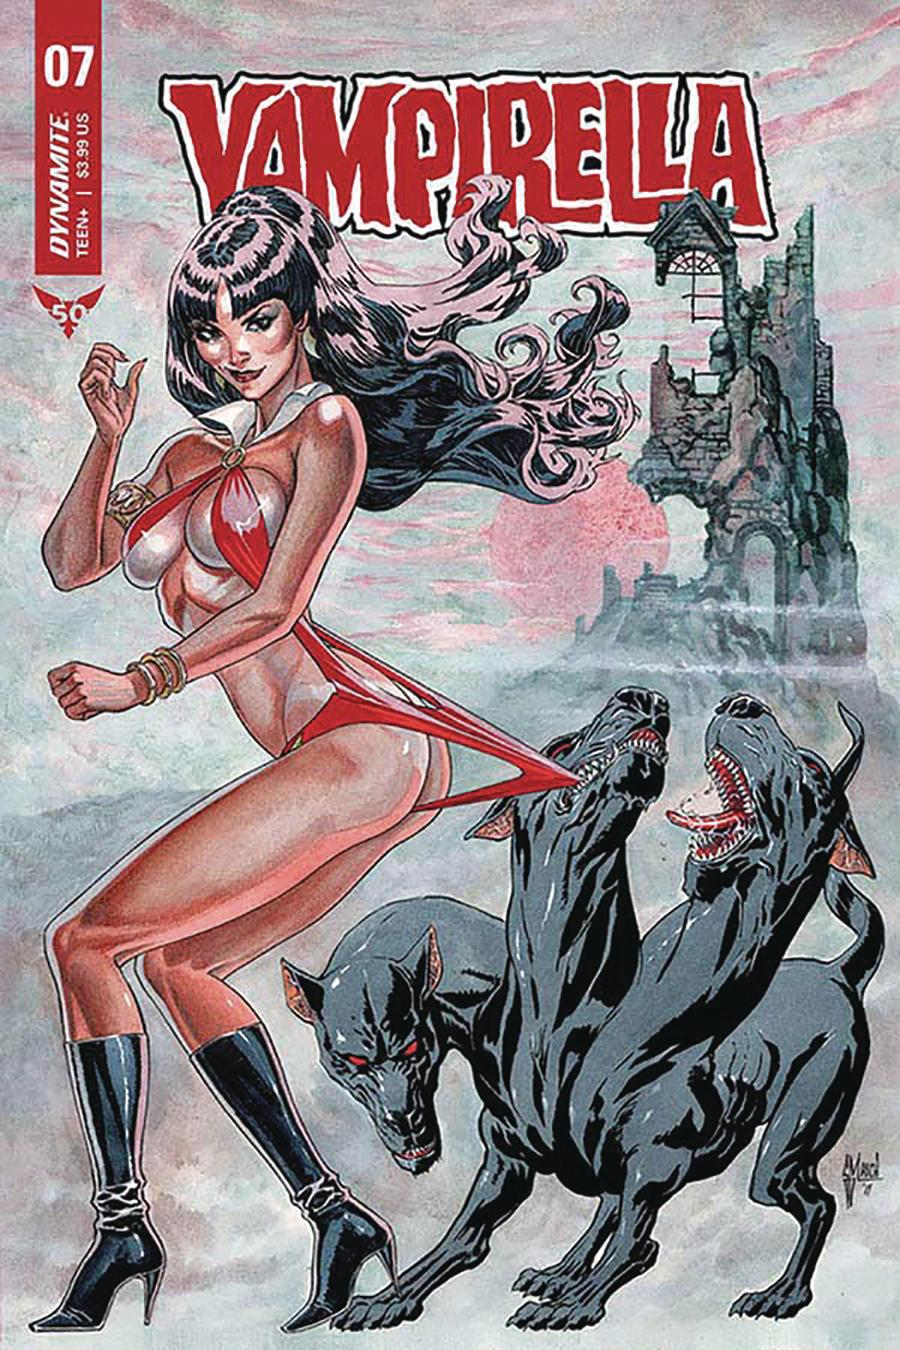 Vampirella Vol 8 #7 Cover B Variant Guillem March Cover